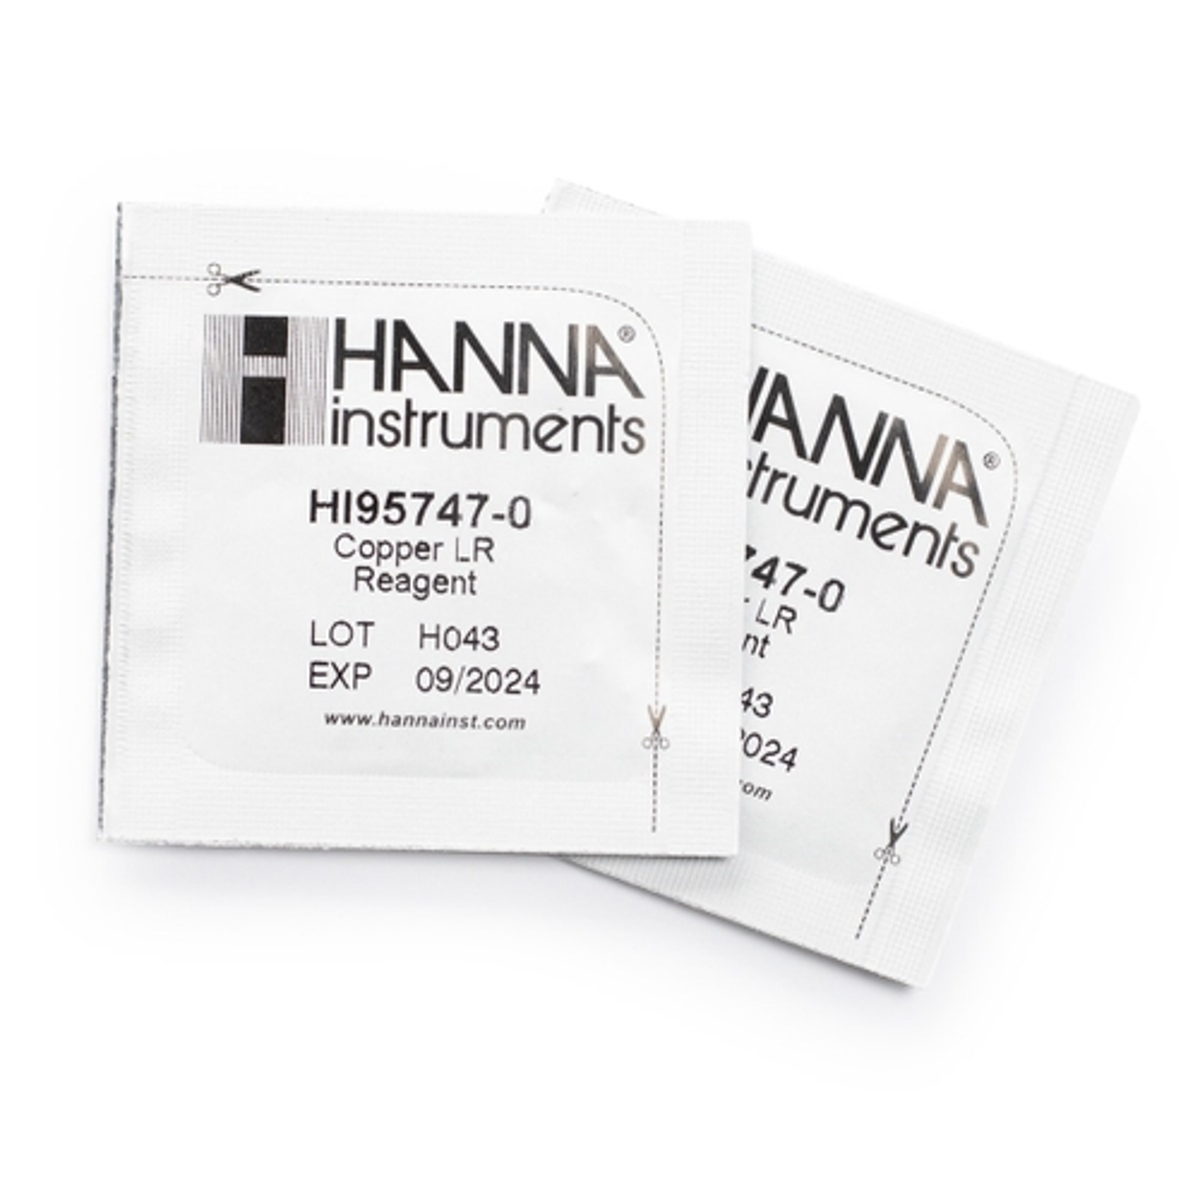 HI95747-01 Copper Low Range Reagents (100 tests)